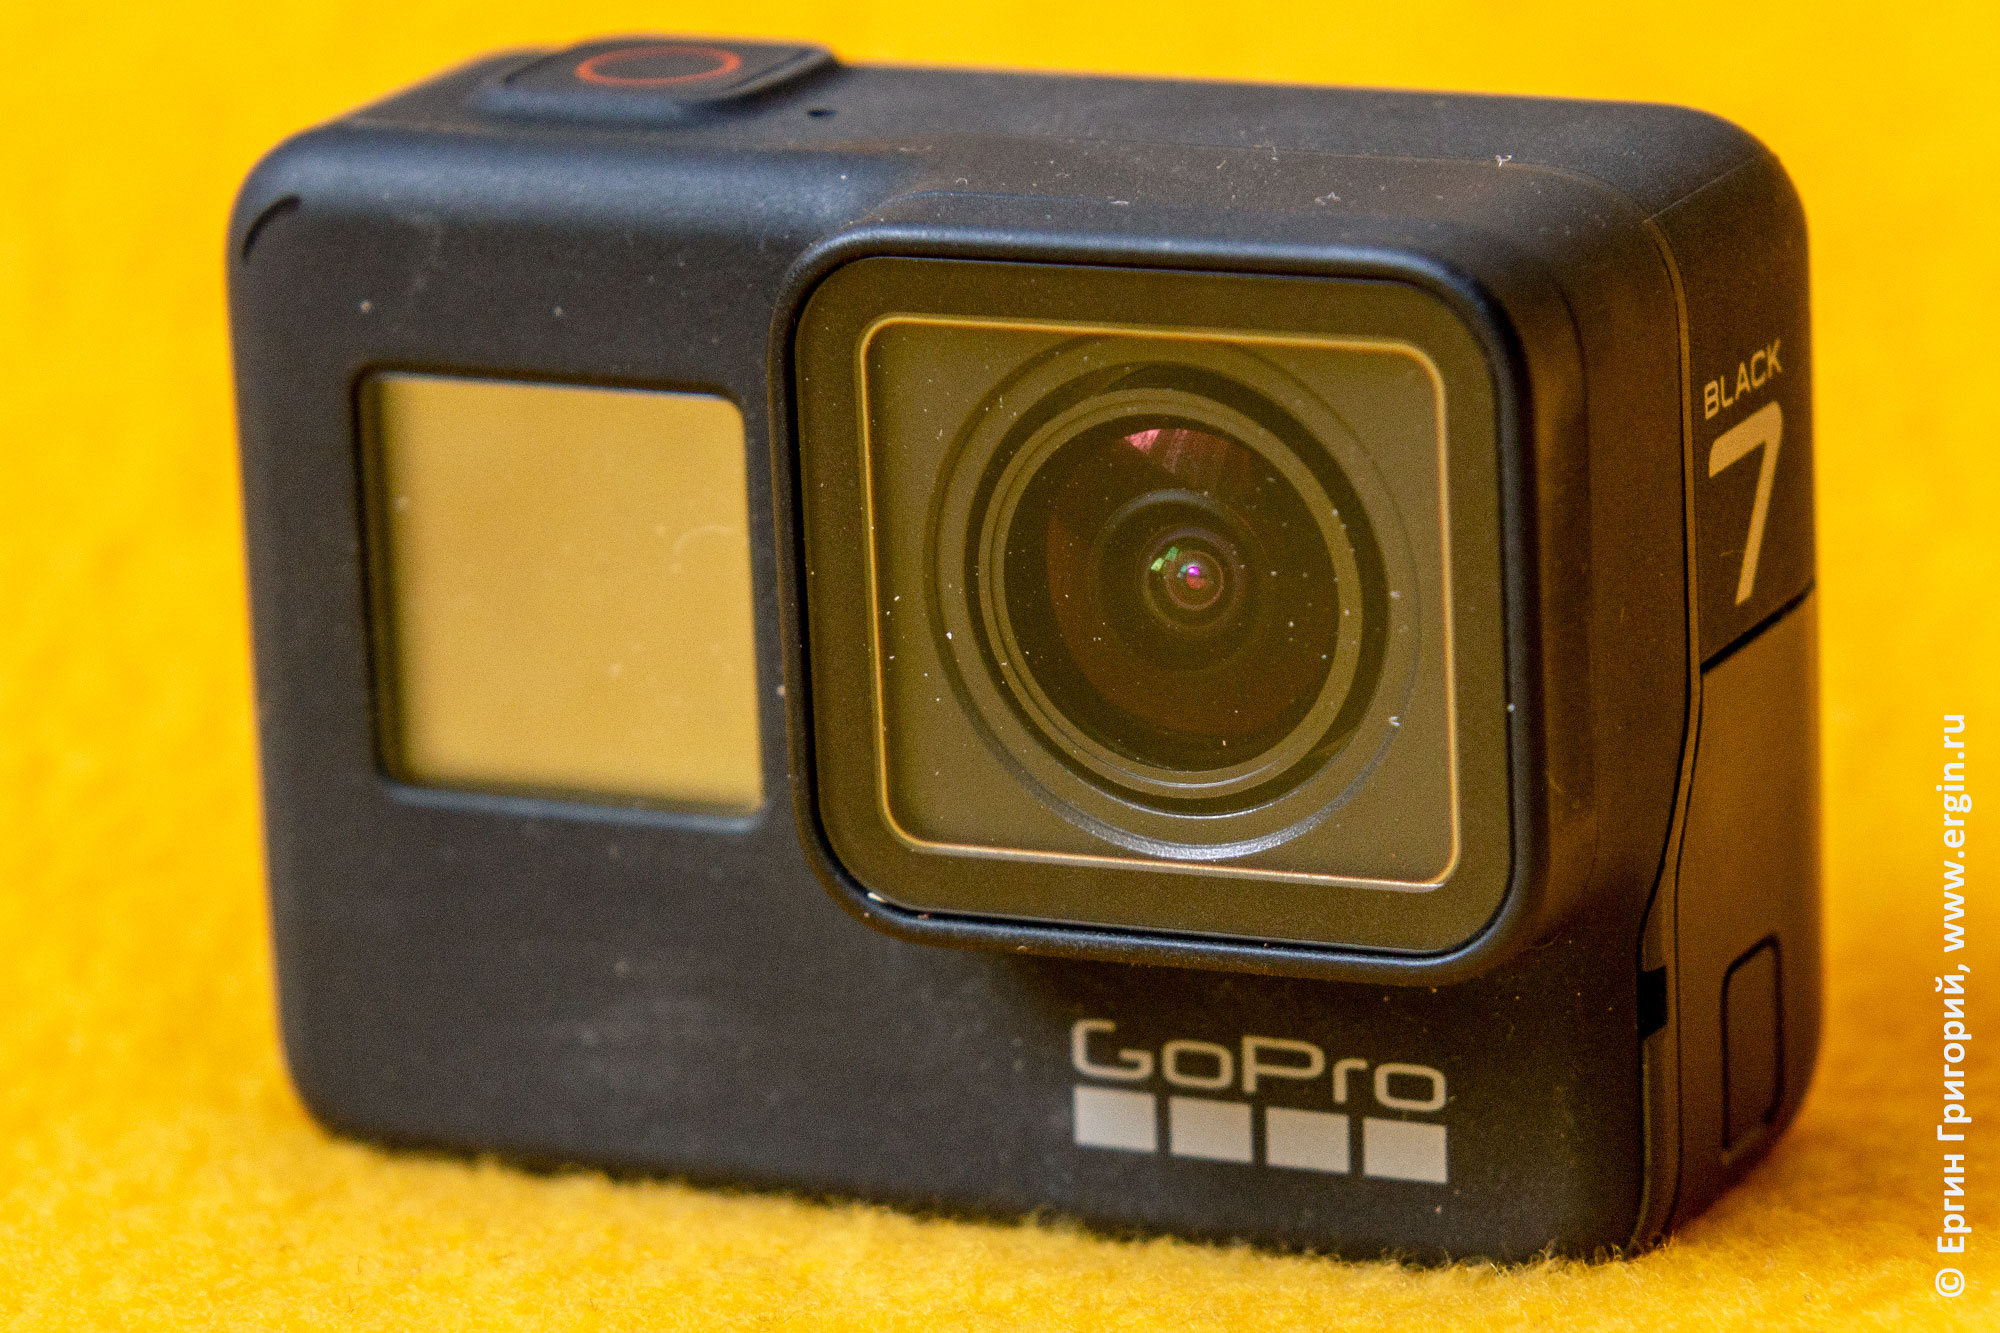 GoPro Hero 7 black экшн-камера обзор